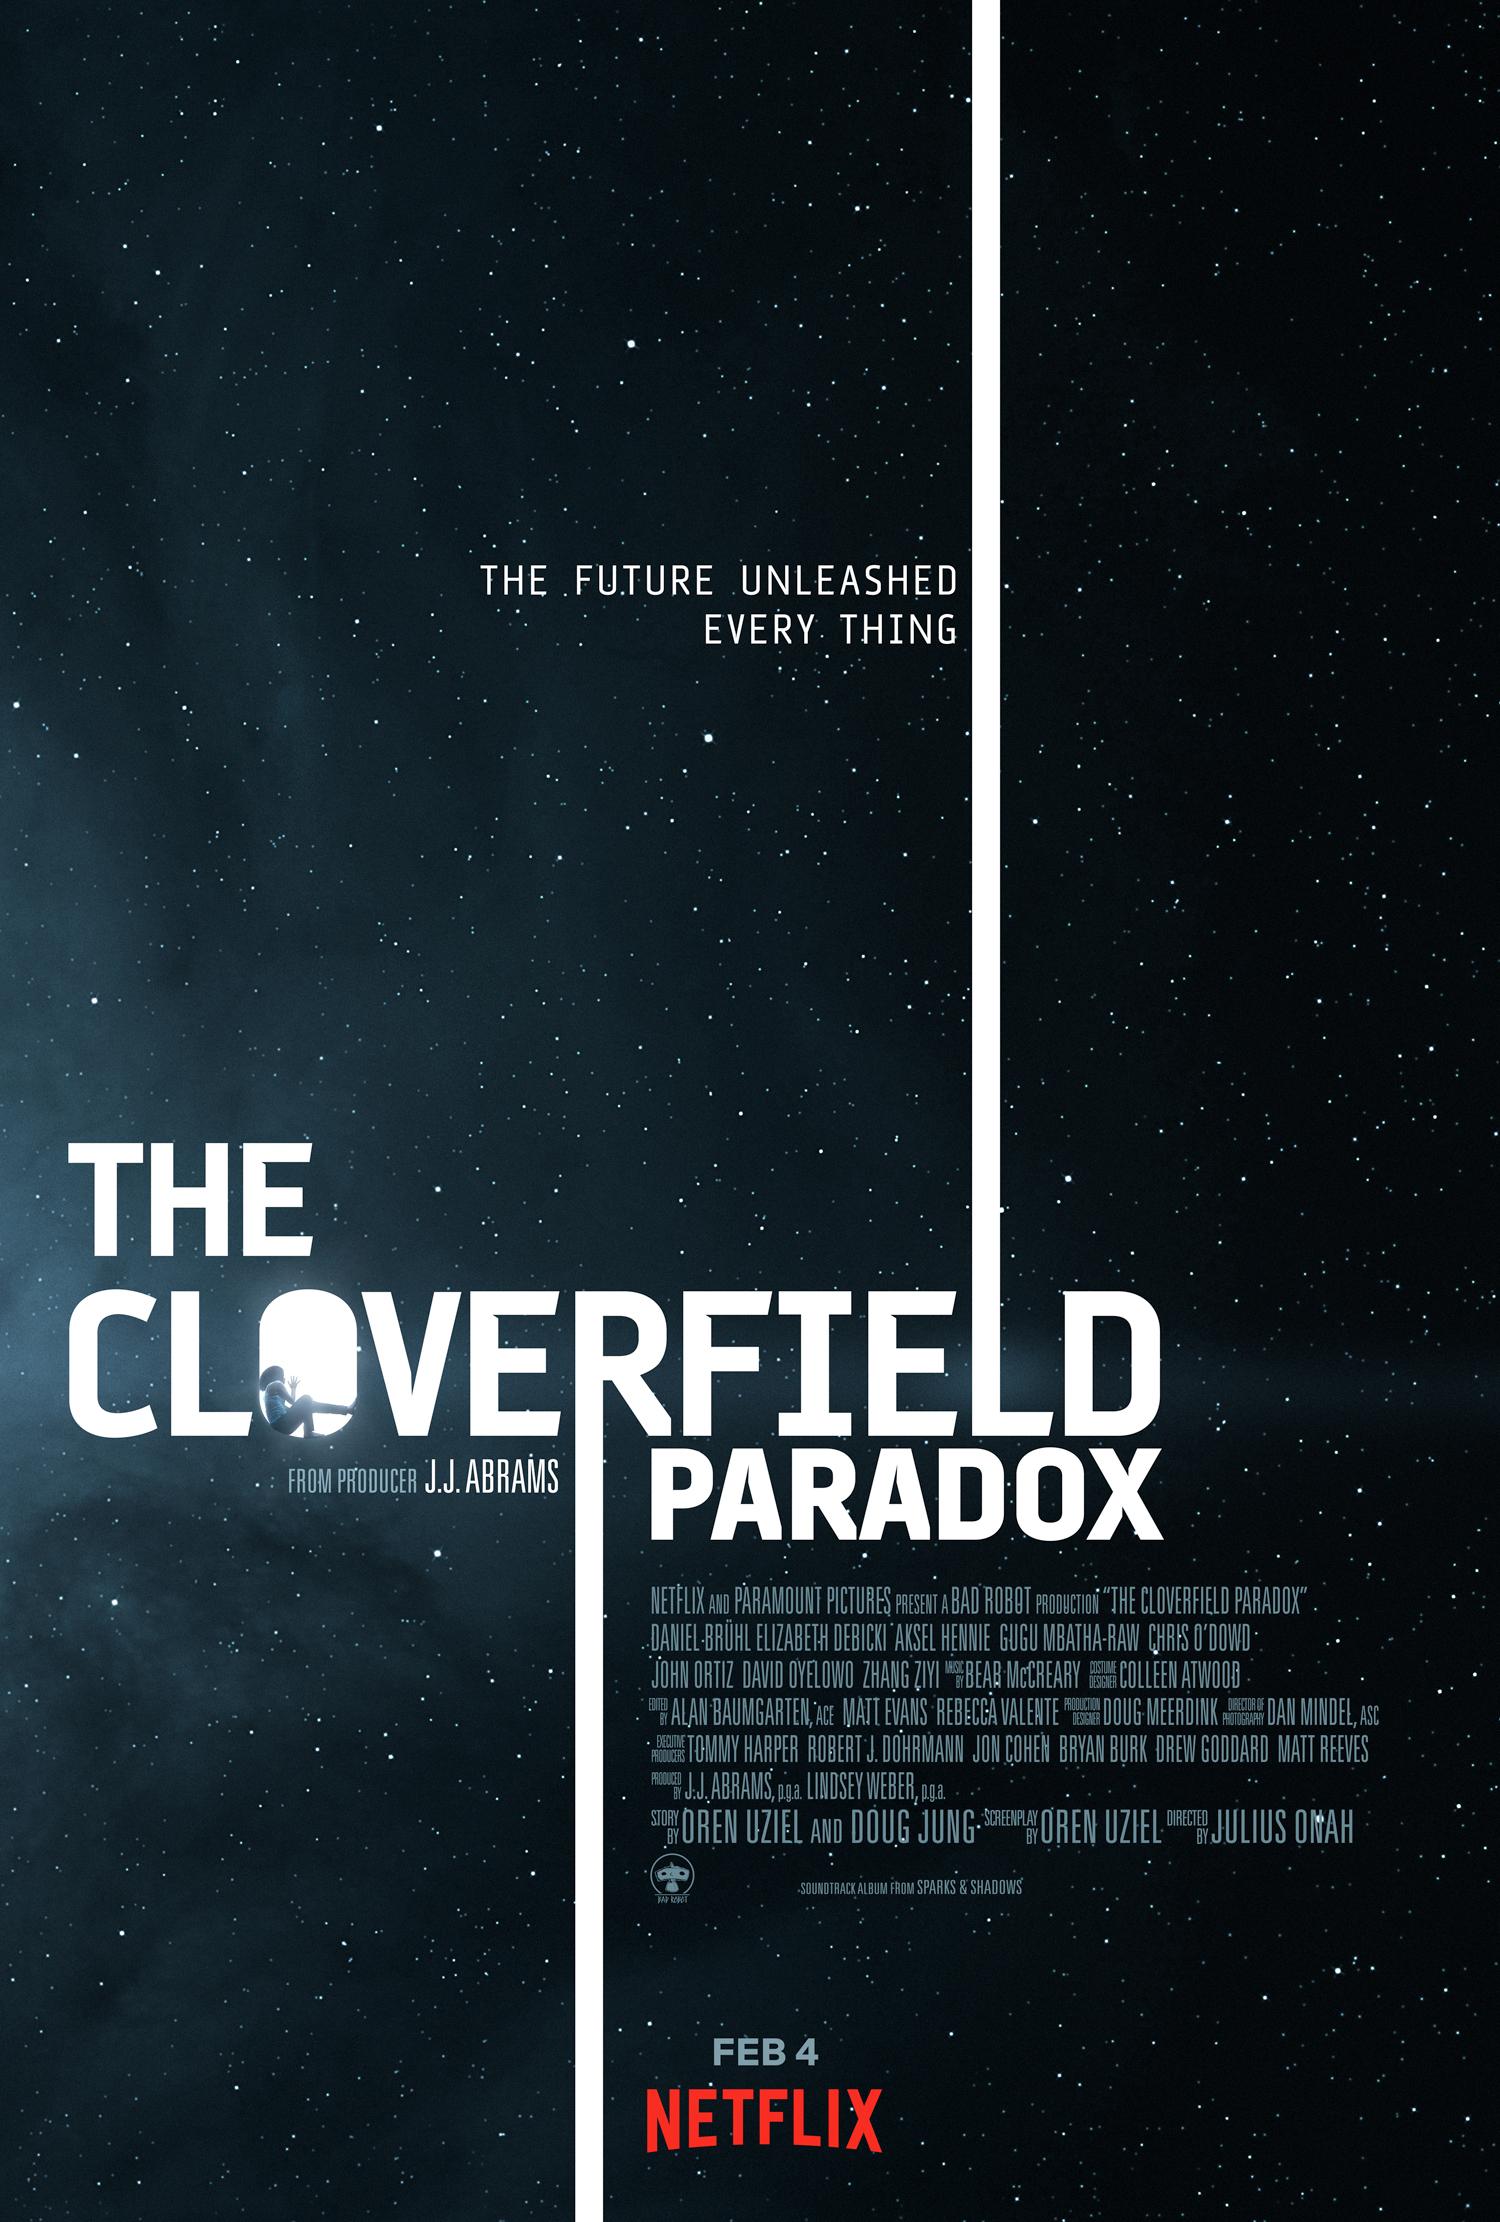 cloverfield-paradox-poster.jpg